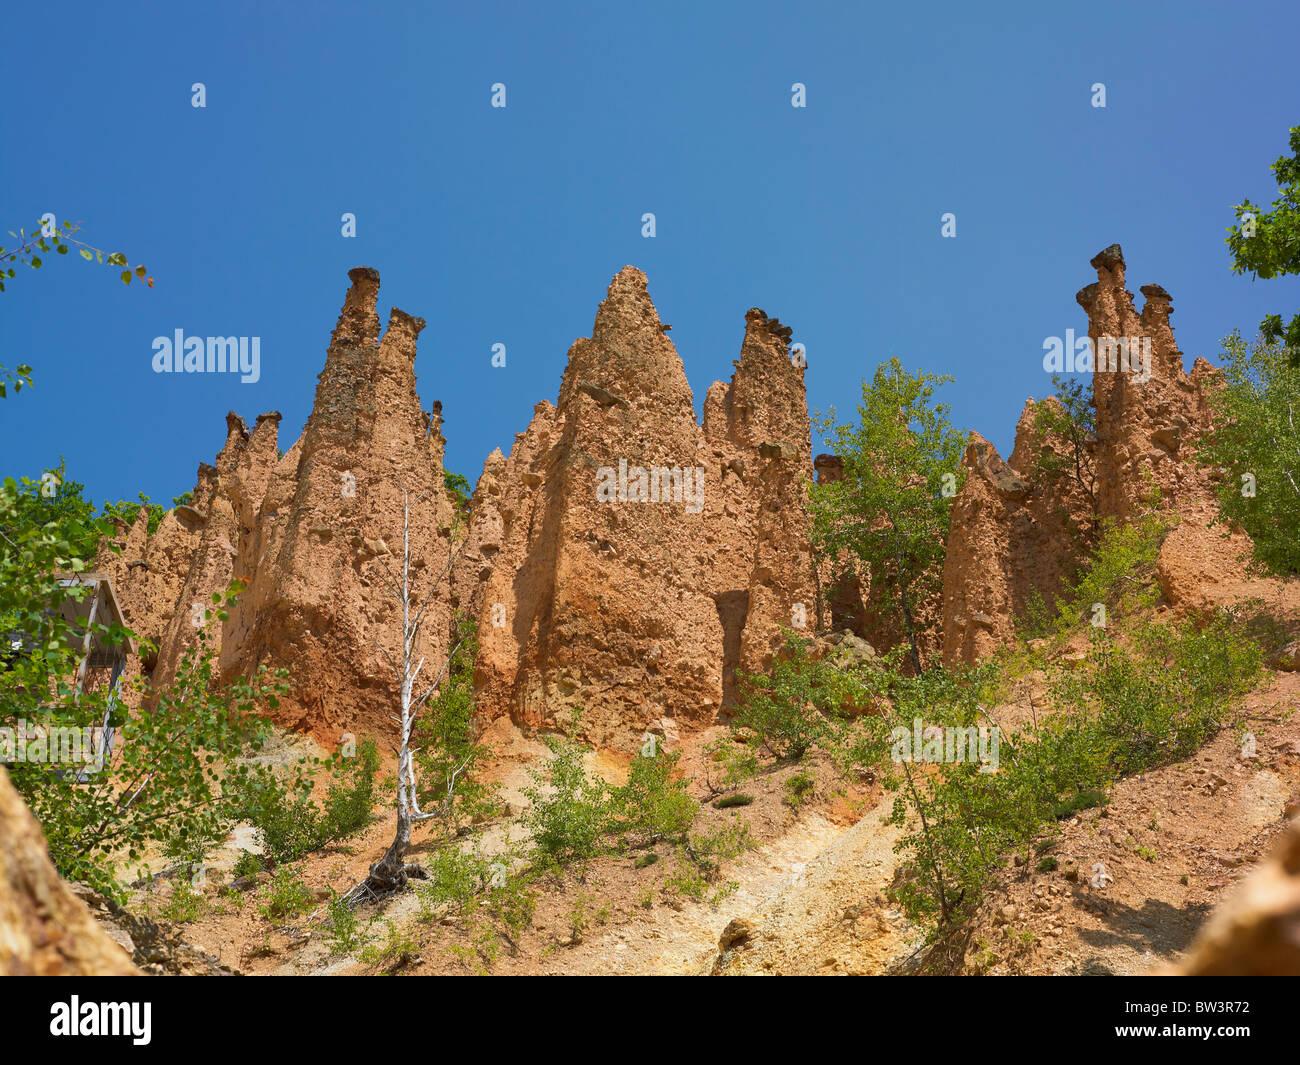 Des Teufels Stadt Naturphänomen In Serbien Stockbild